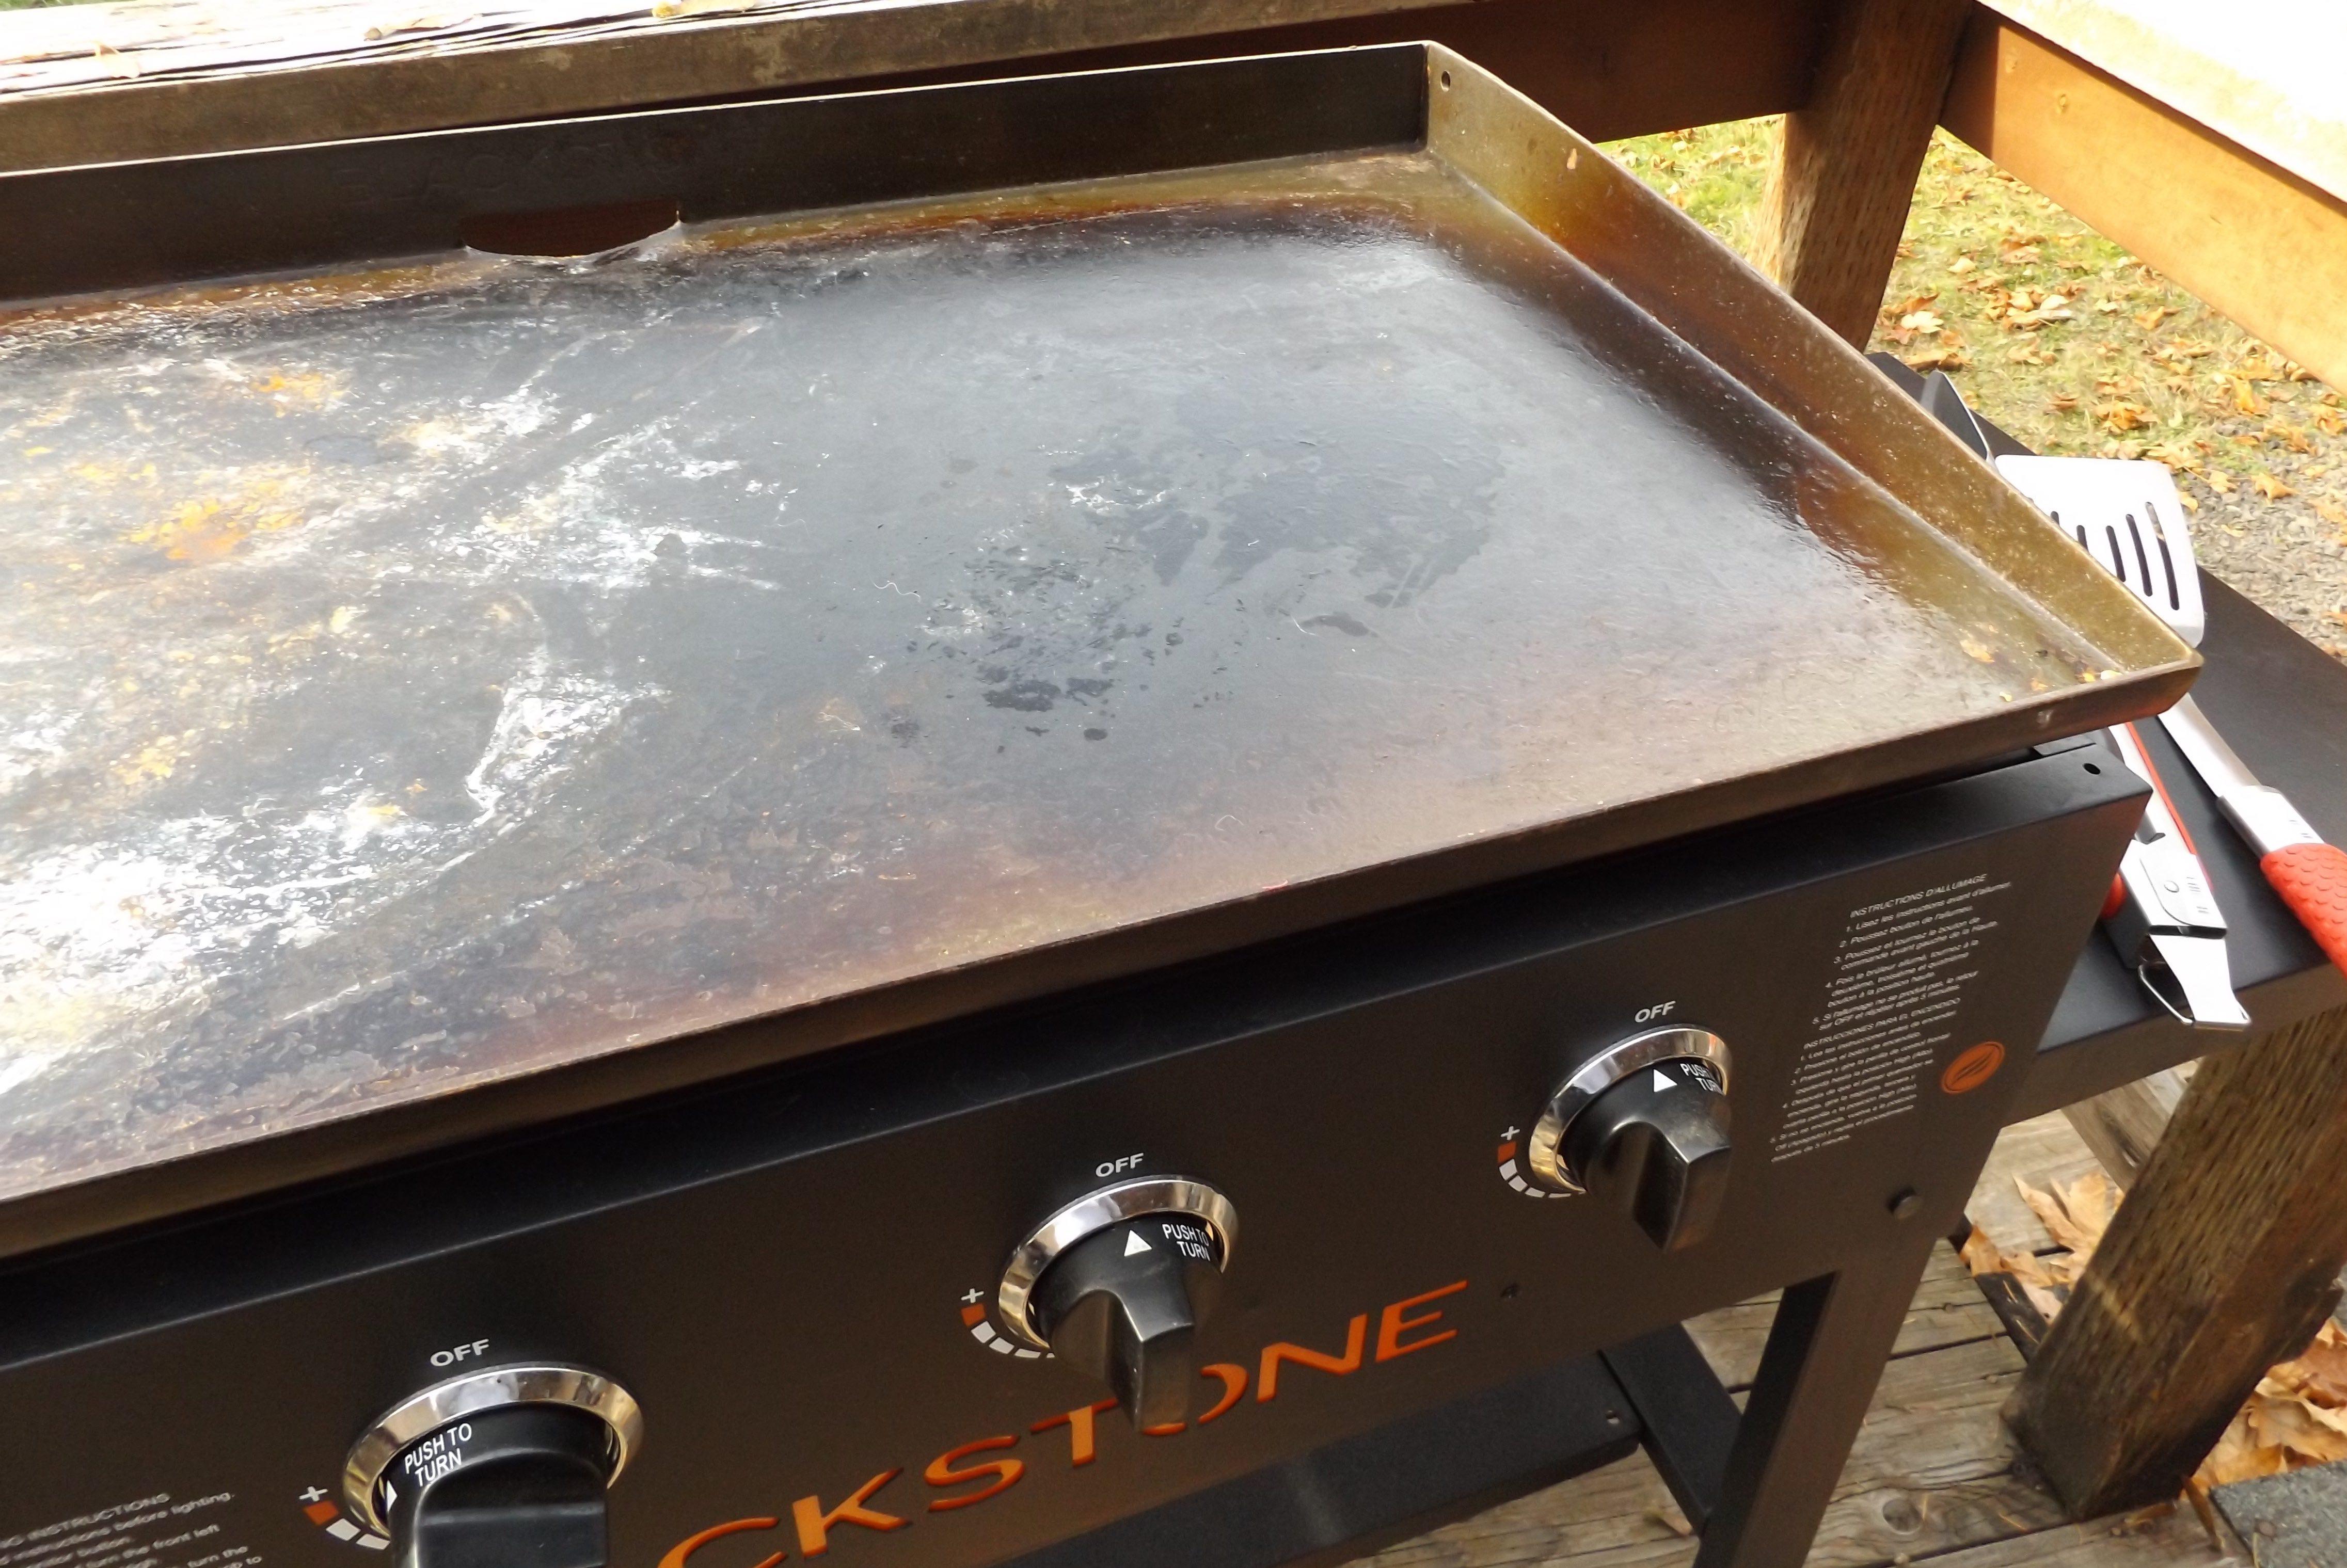 Blackstone Griddle review, by Pat Cascio. Four burners